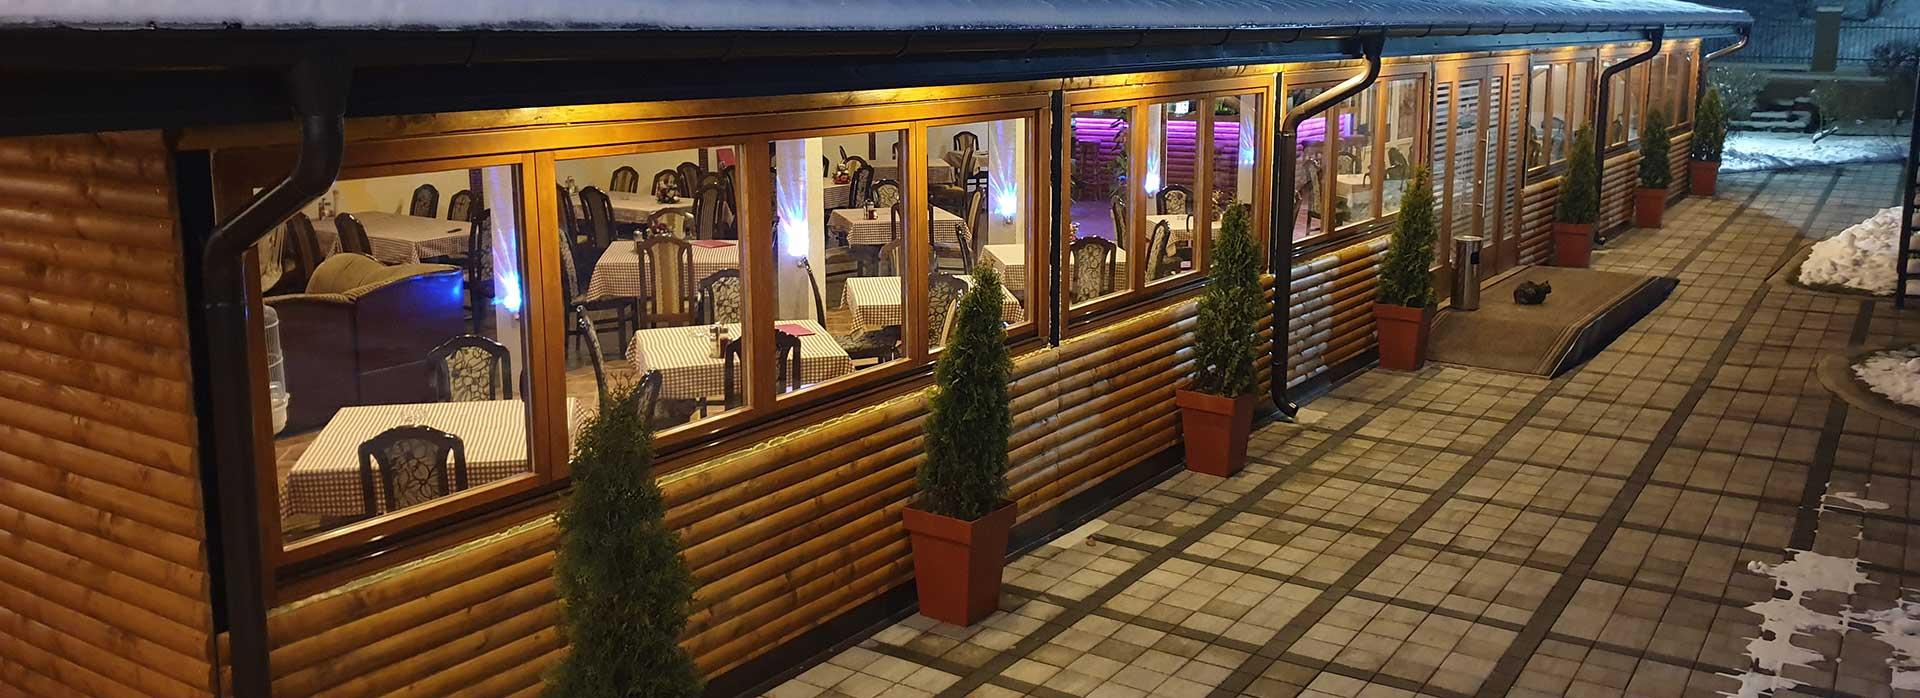 sisevac-restoran (2)